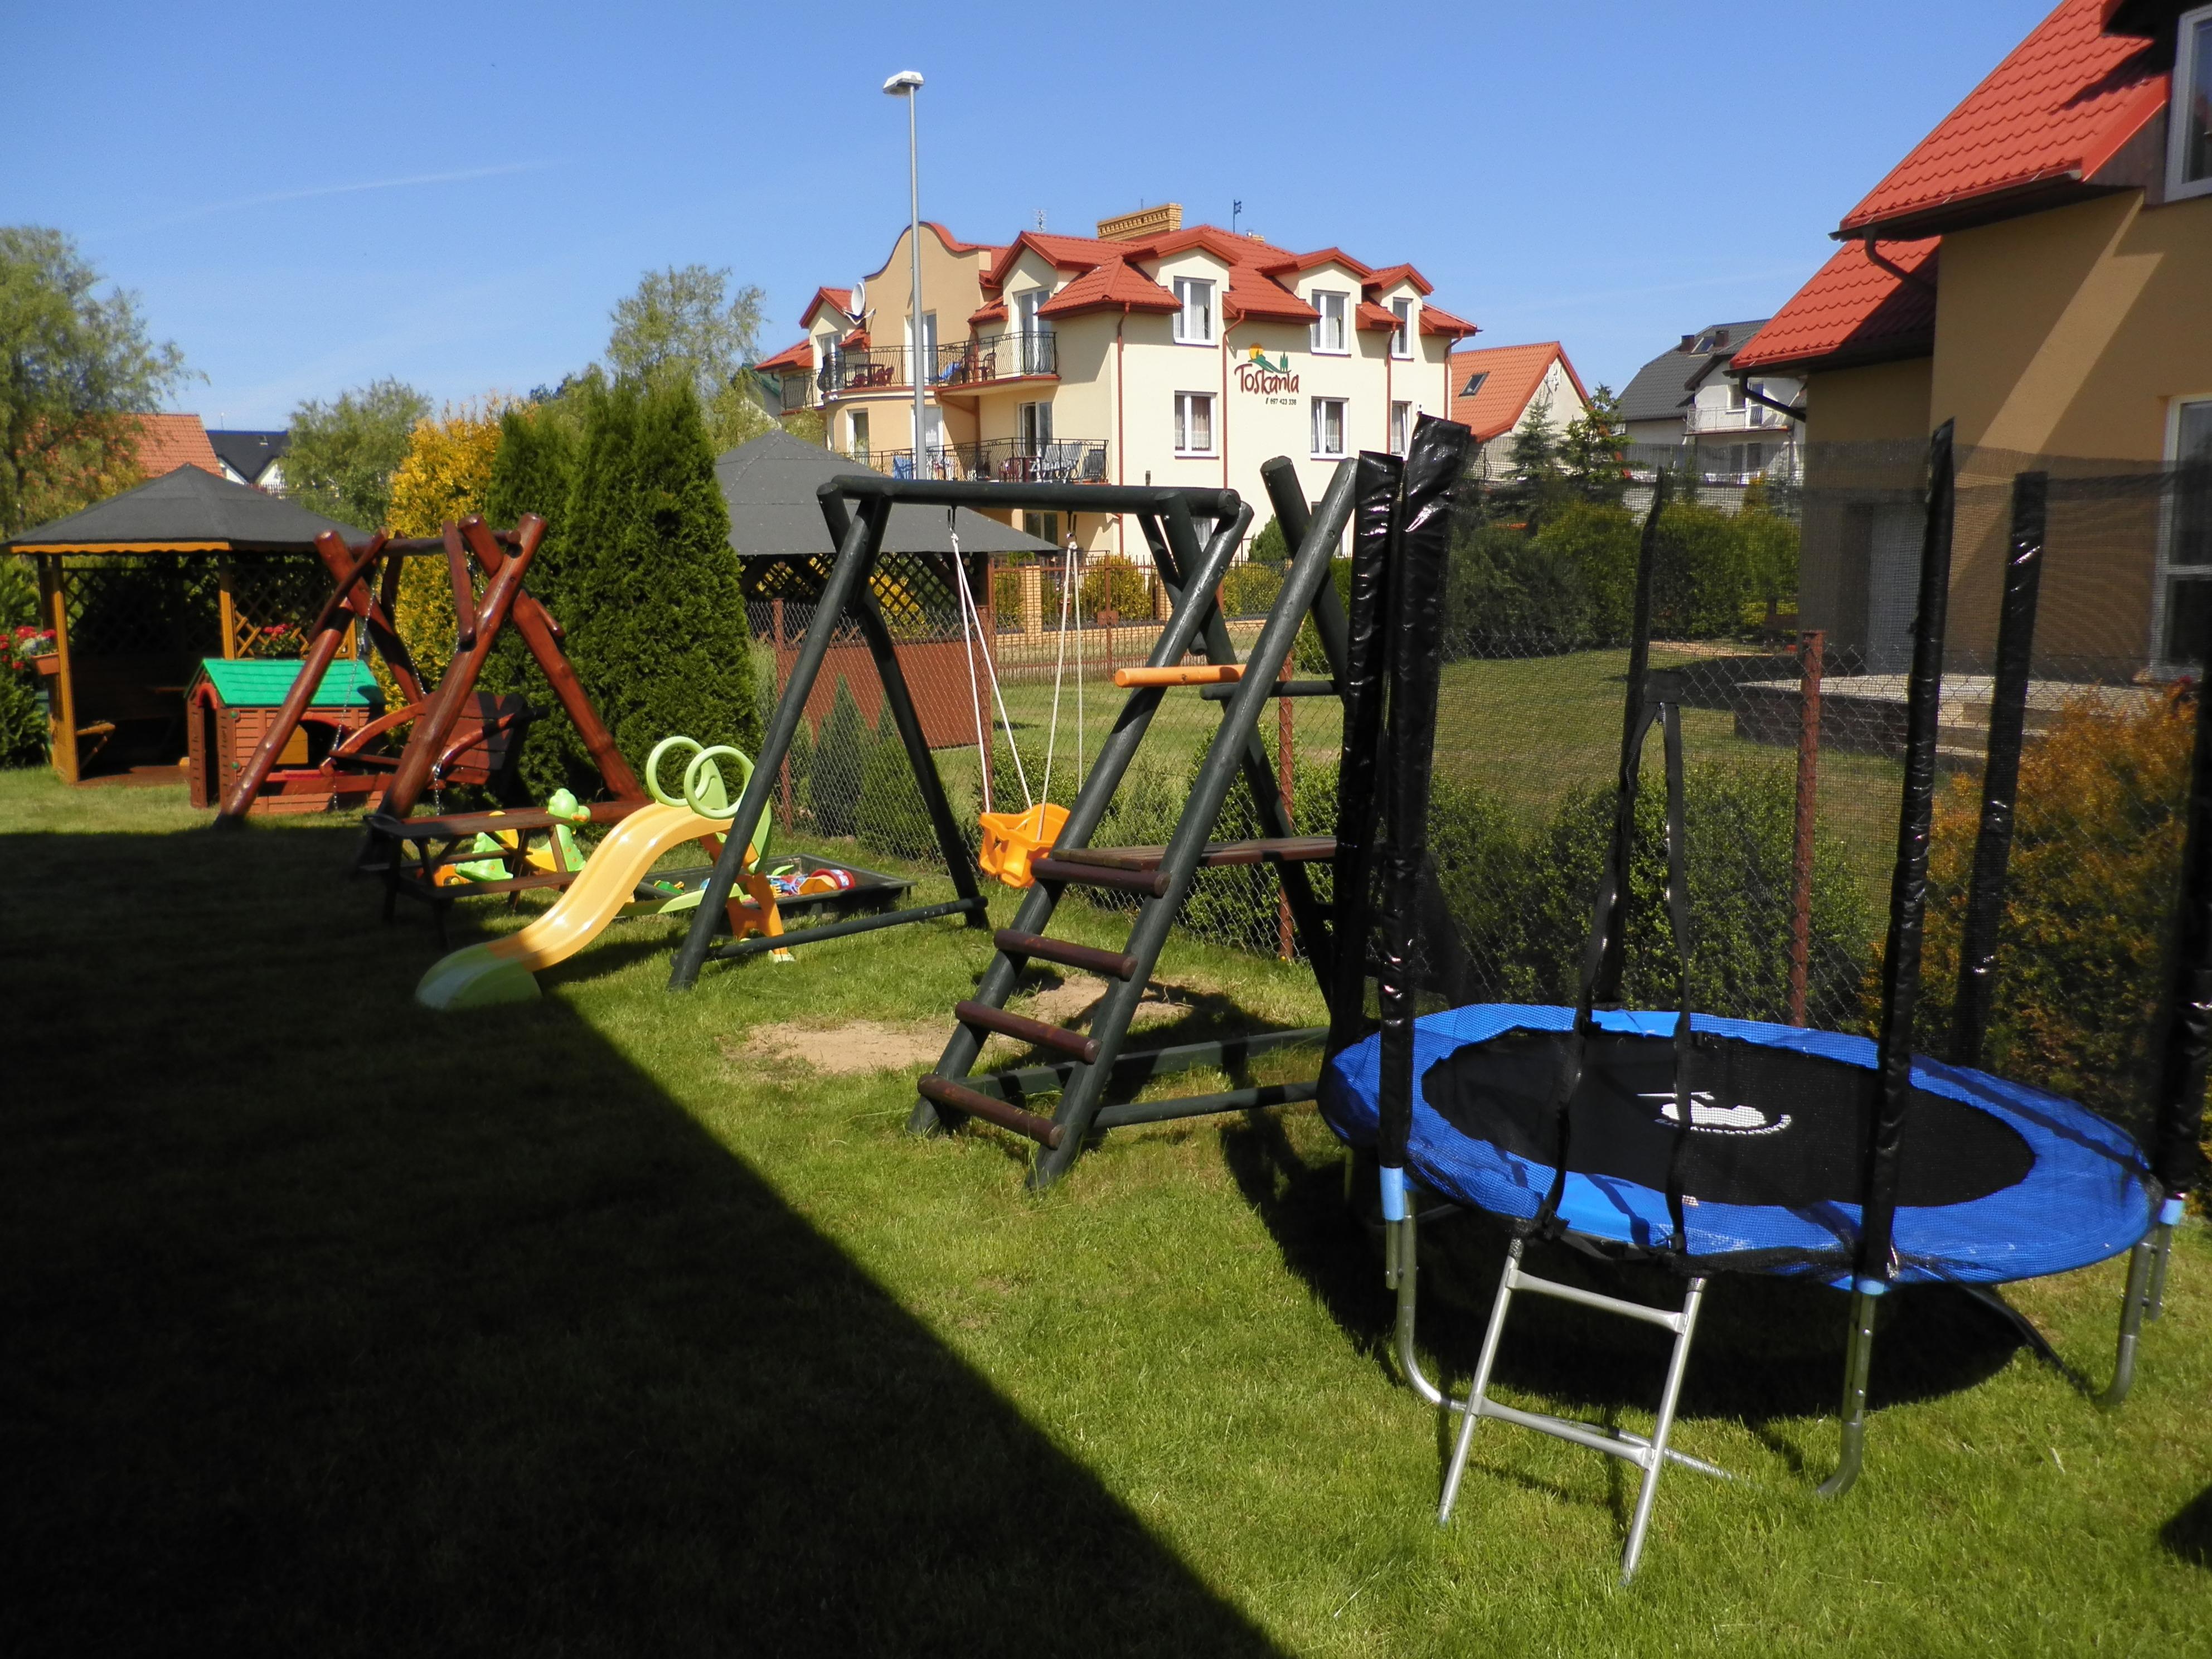 http://www.karwia.ws/karwia-rafa-trampol.jpg